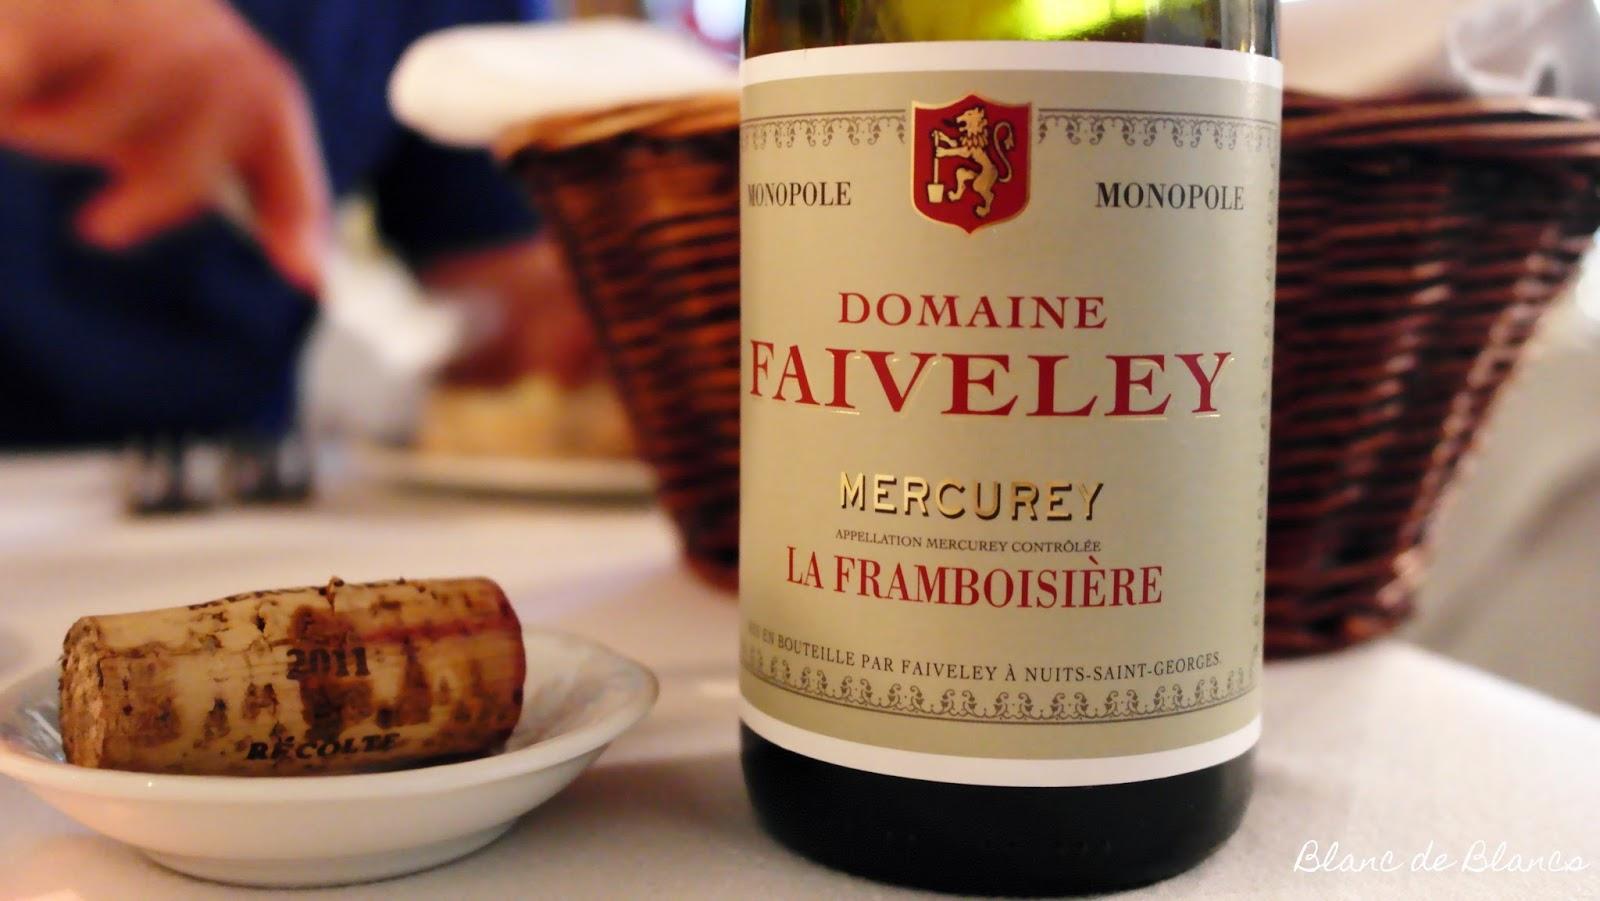 Domaine Faiveley Mercurey La Framboisière - www.blancdeblancs.fi